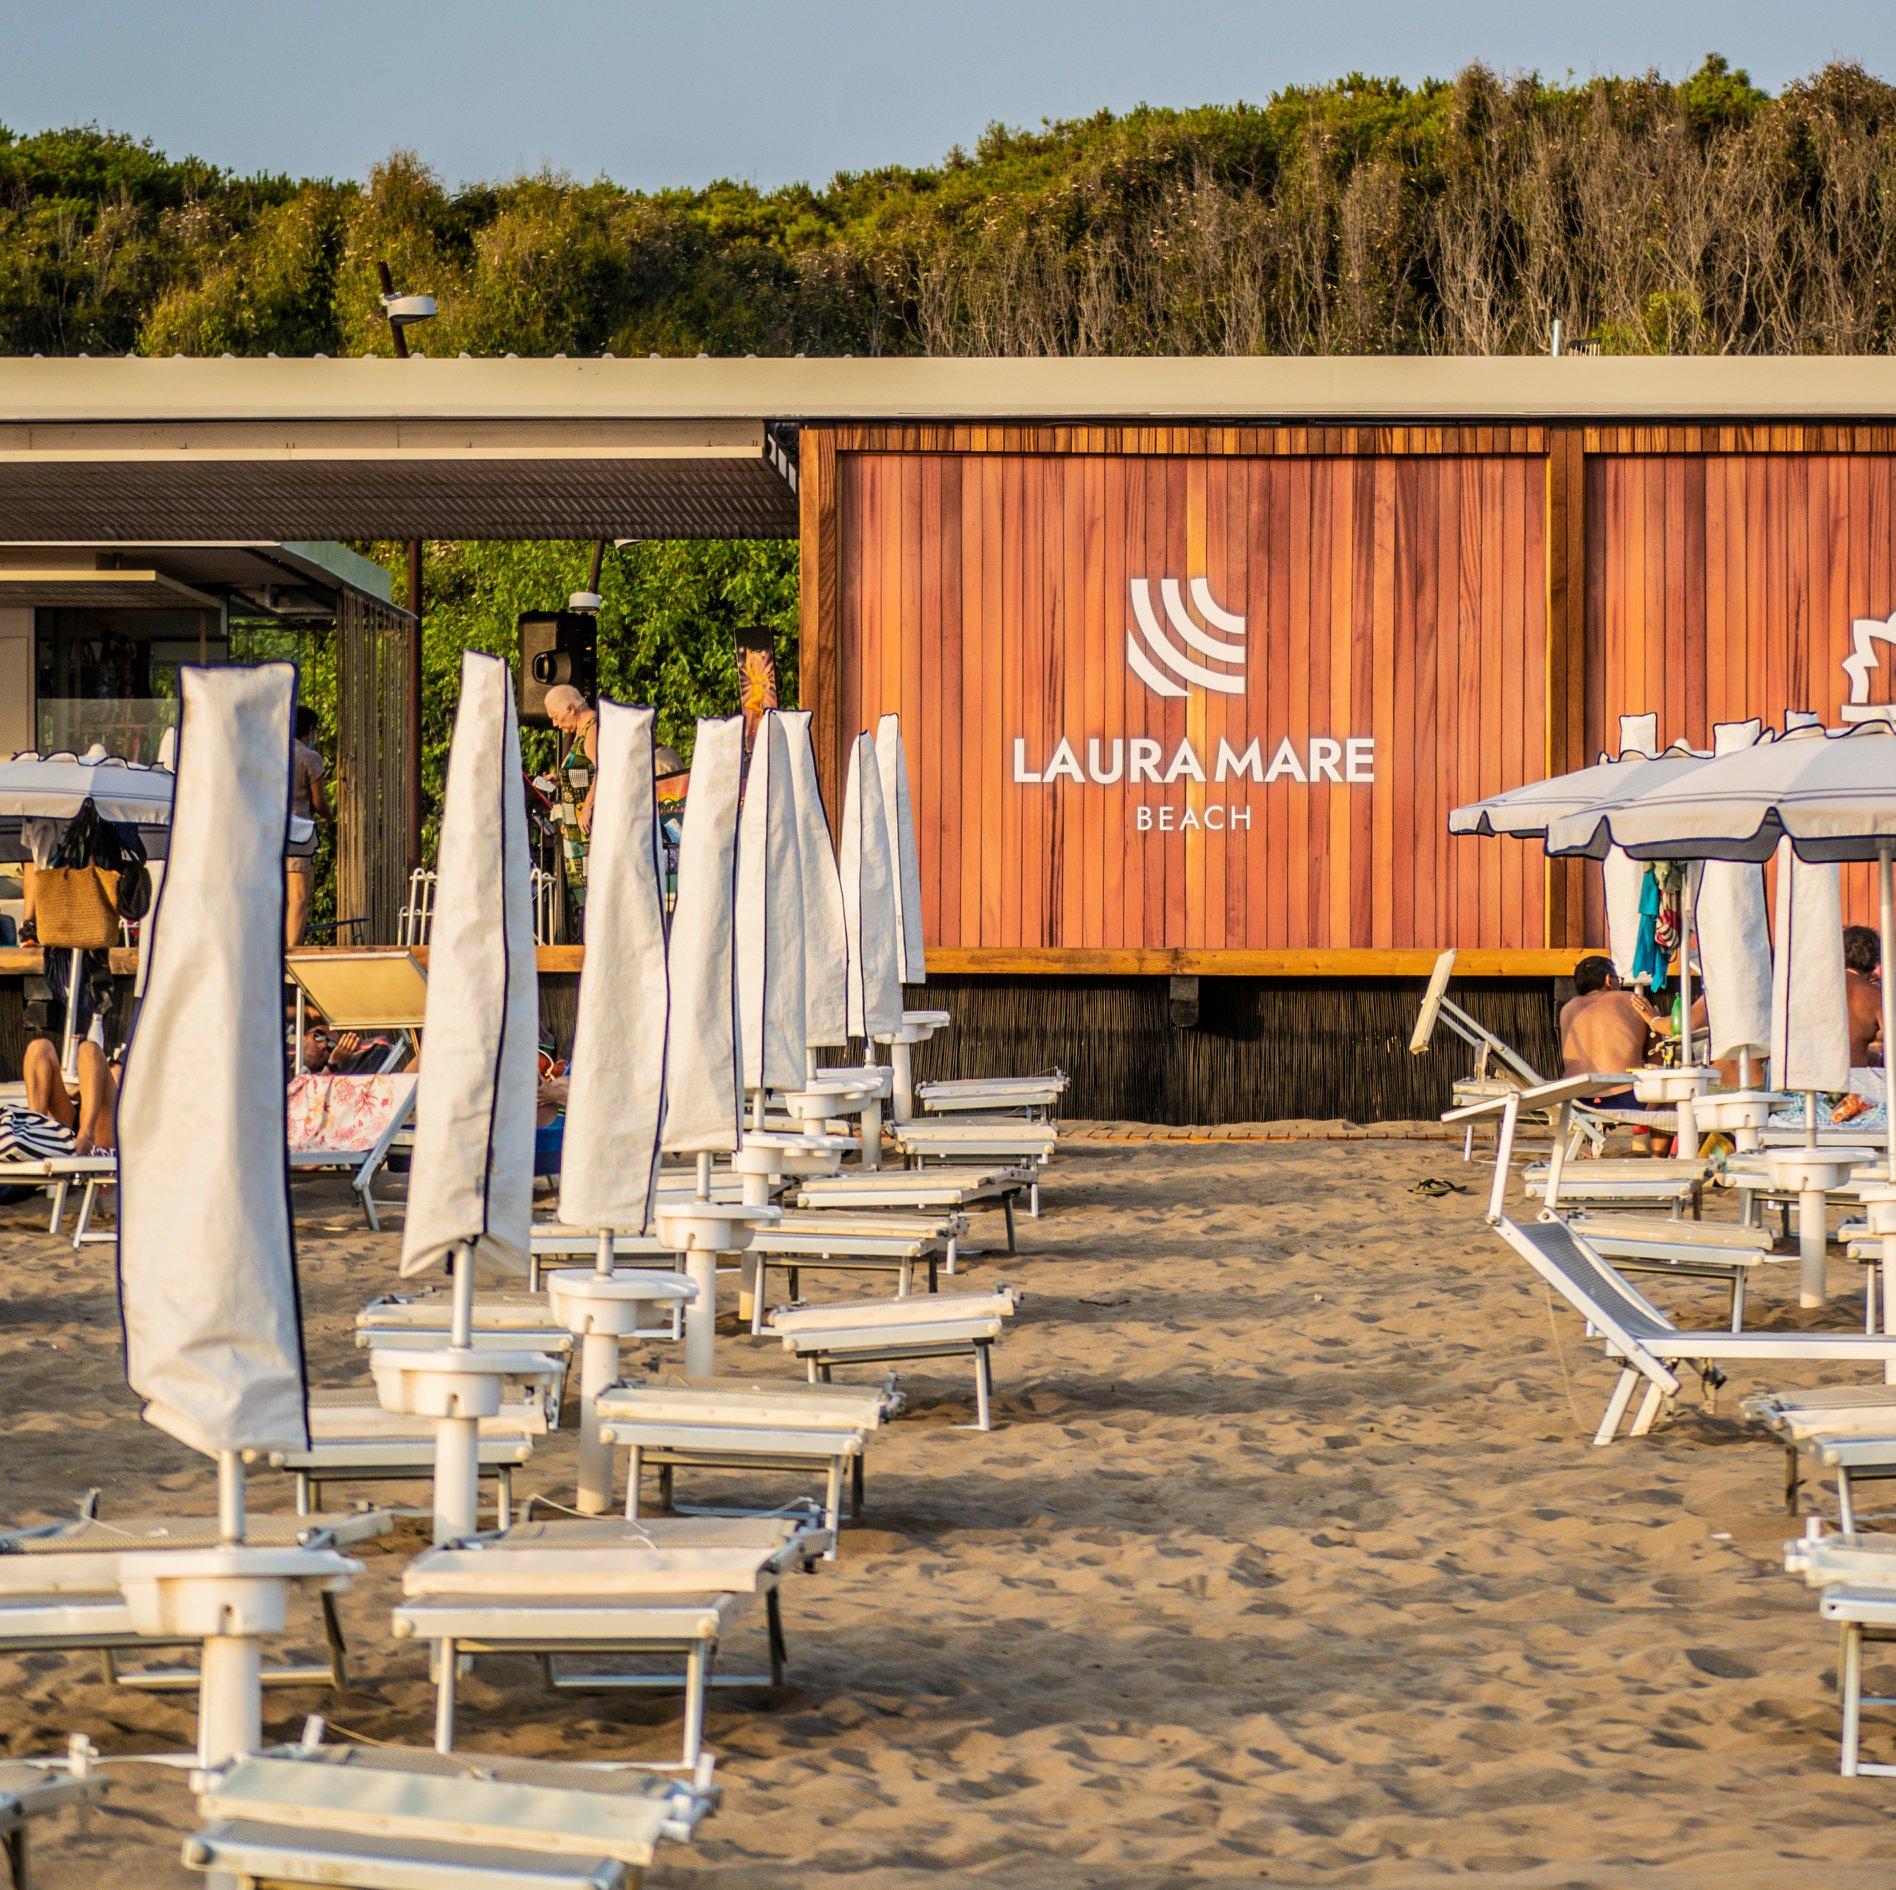 Laura Mare Beach